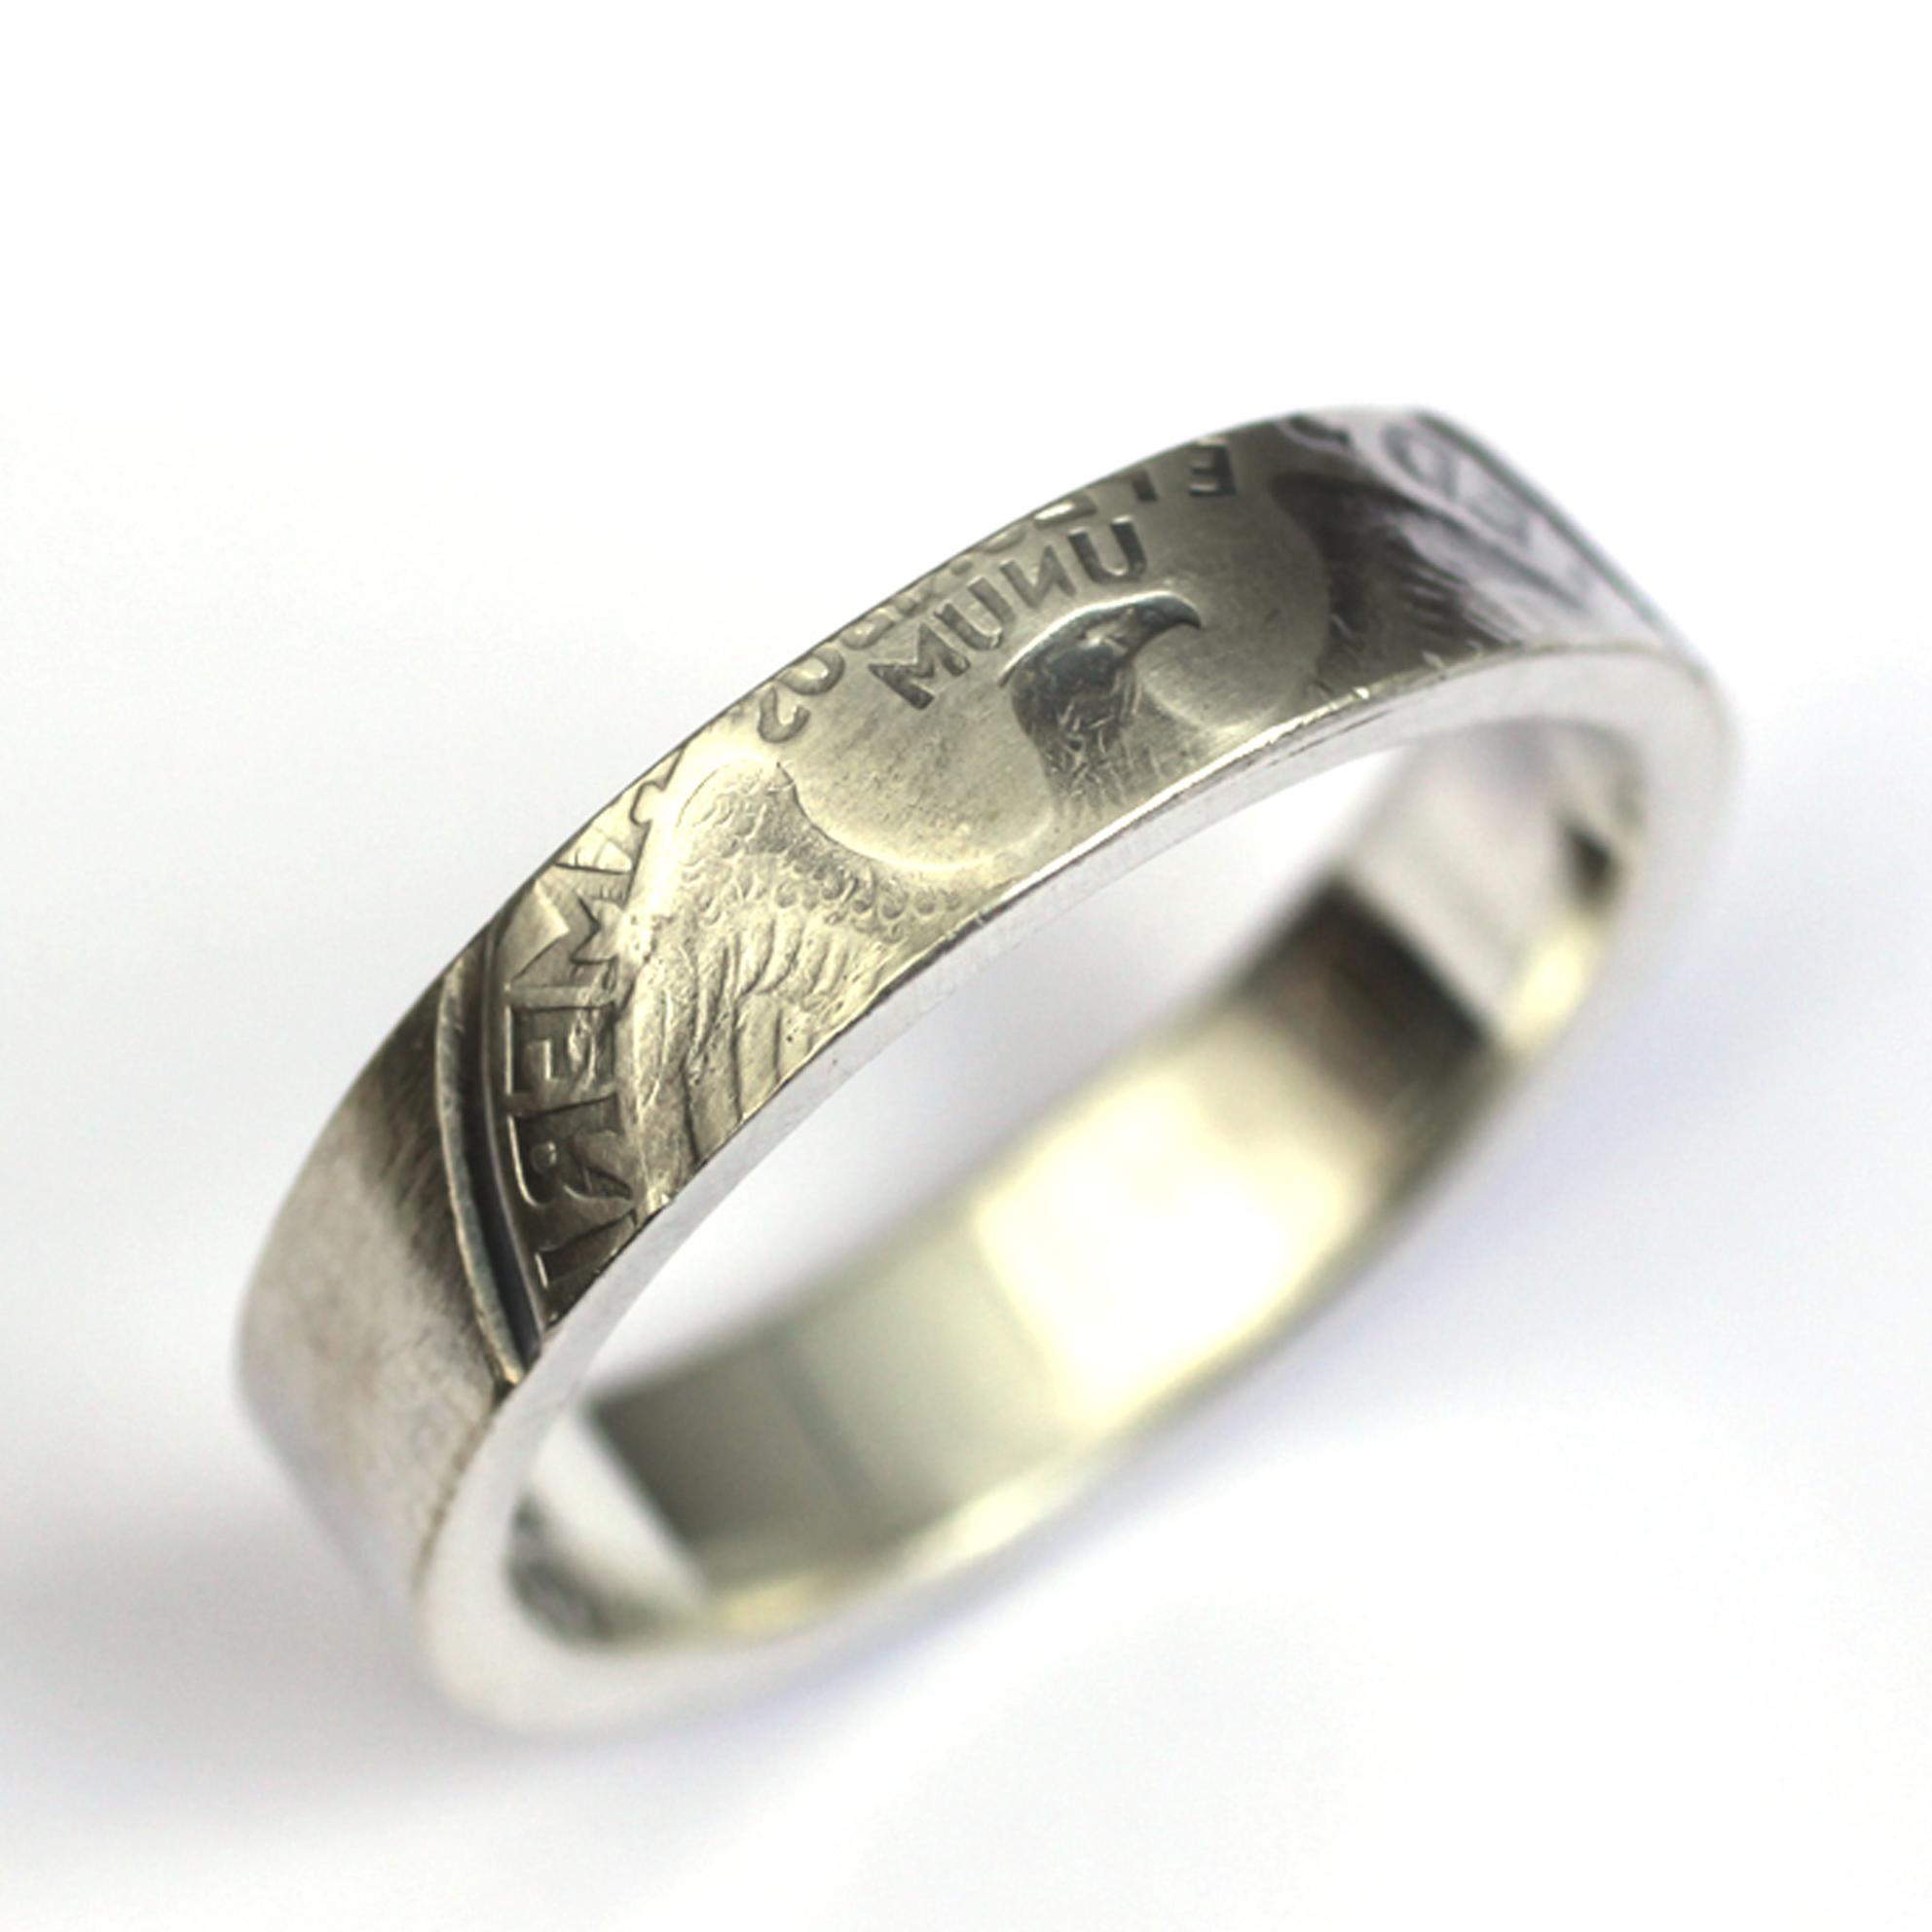 World Travel Ring